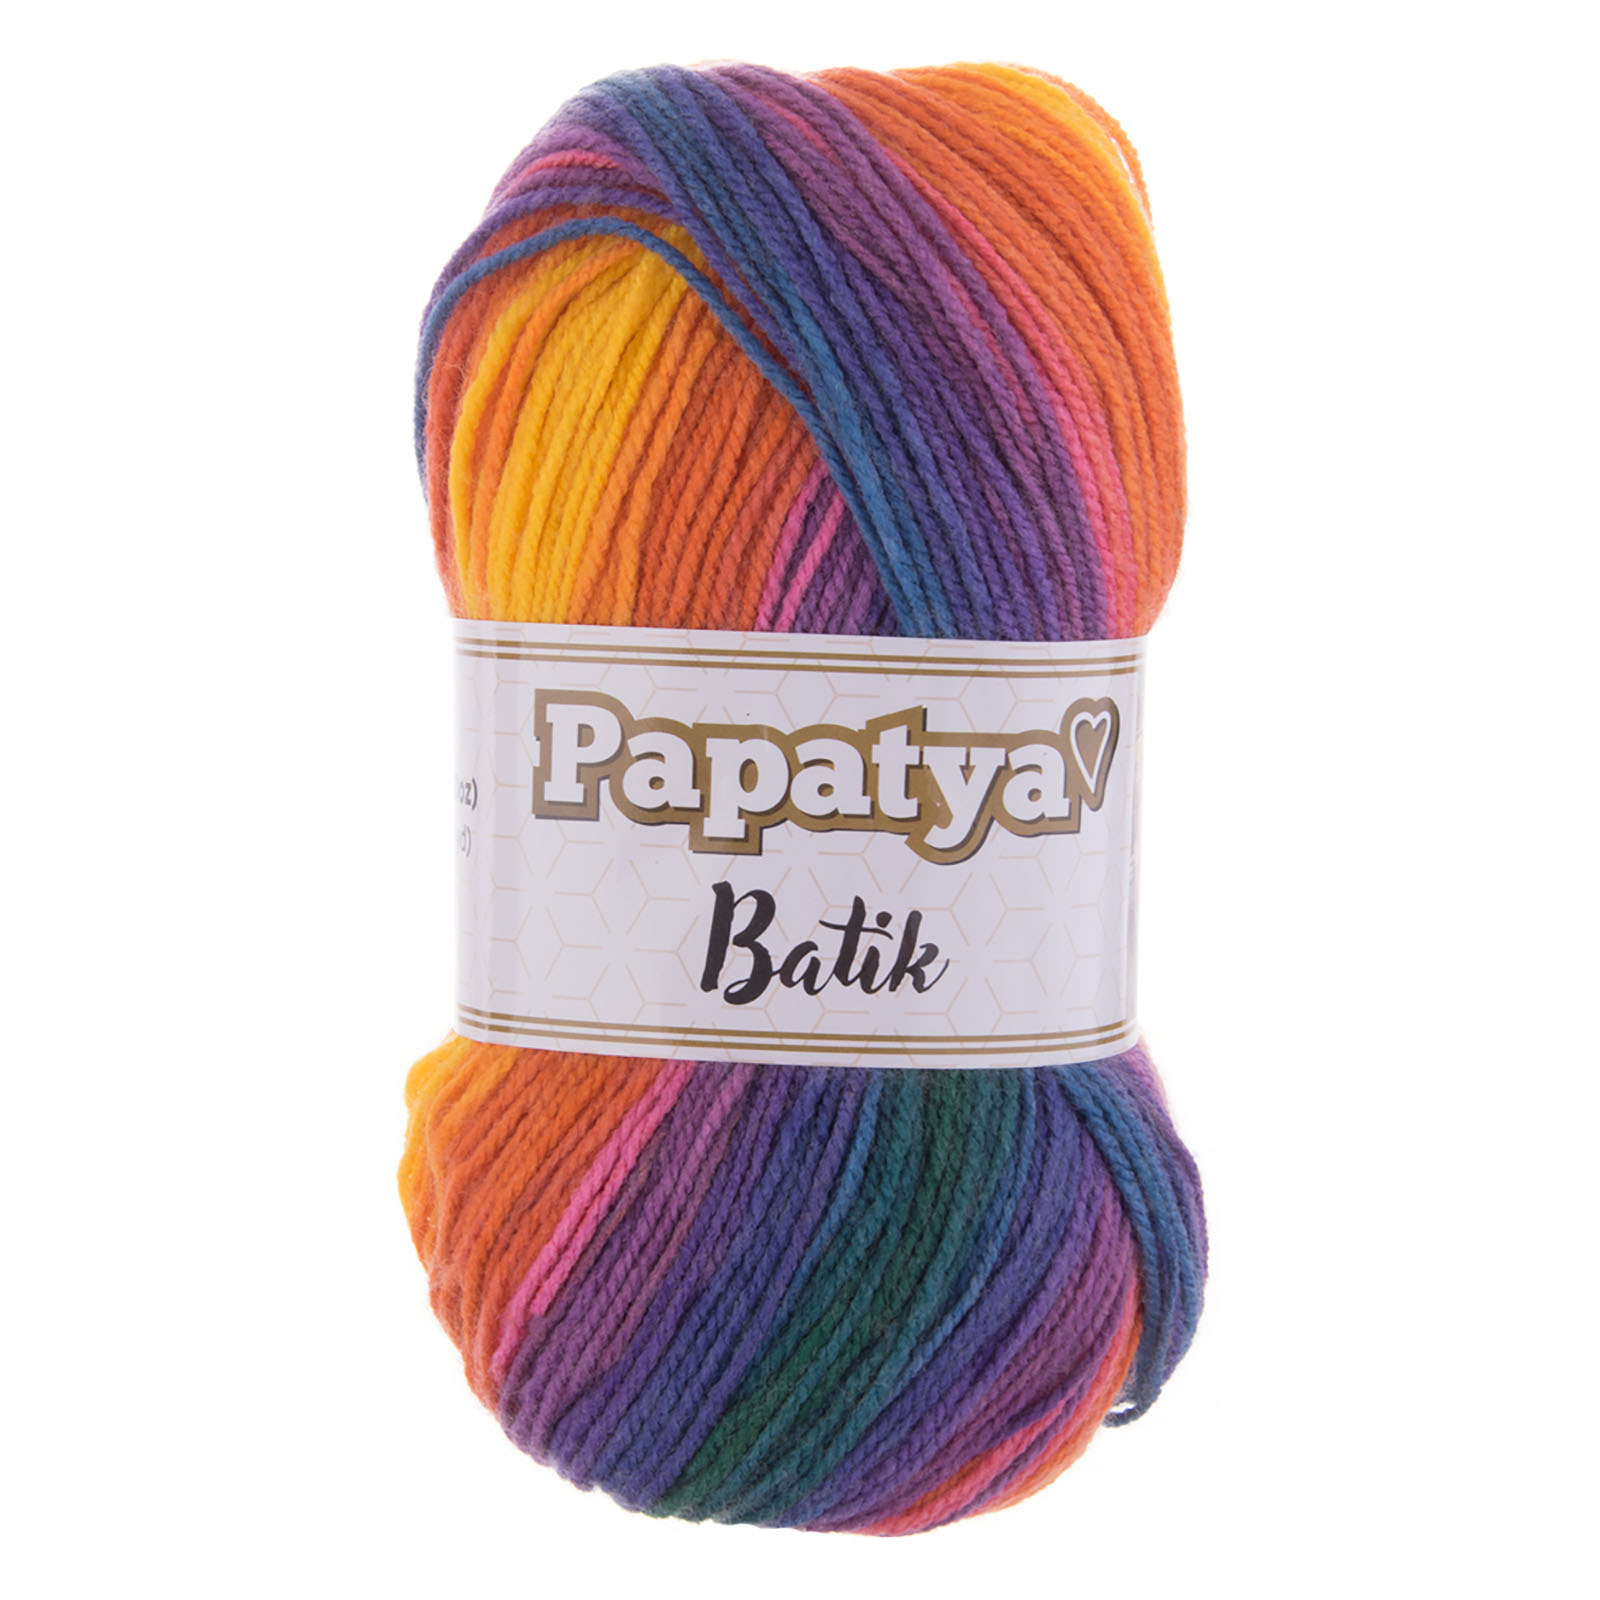 100g Farbverlaufsgarn Papatya Batik Strick-Wolle Strickgarn Häkelgarn Farbwahl – Bild 6